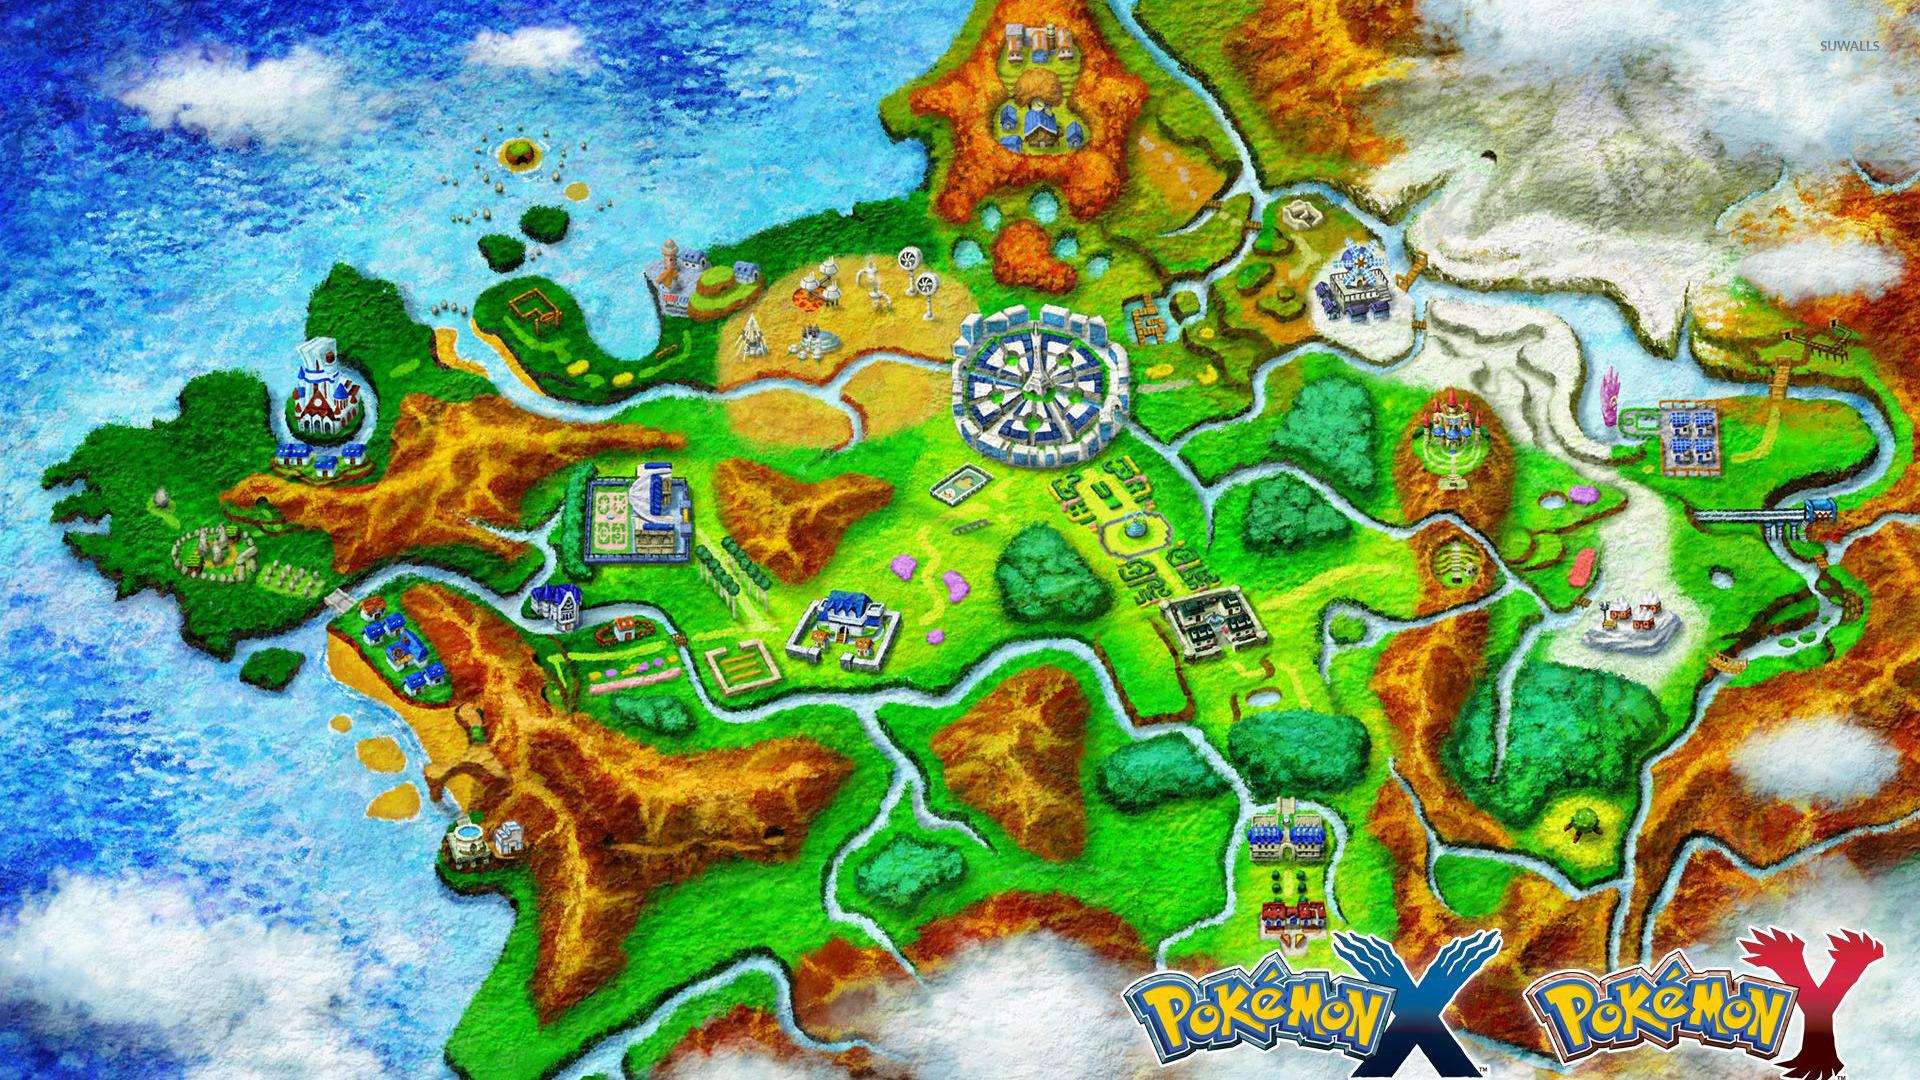 Kalos Pokemon Wallpaper Game Wallpapers 41451